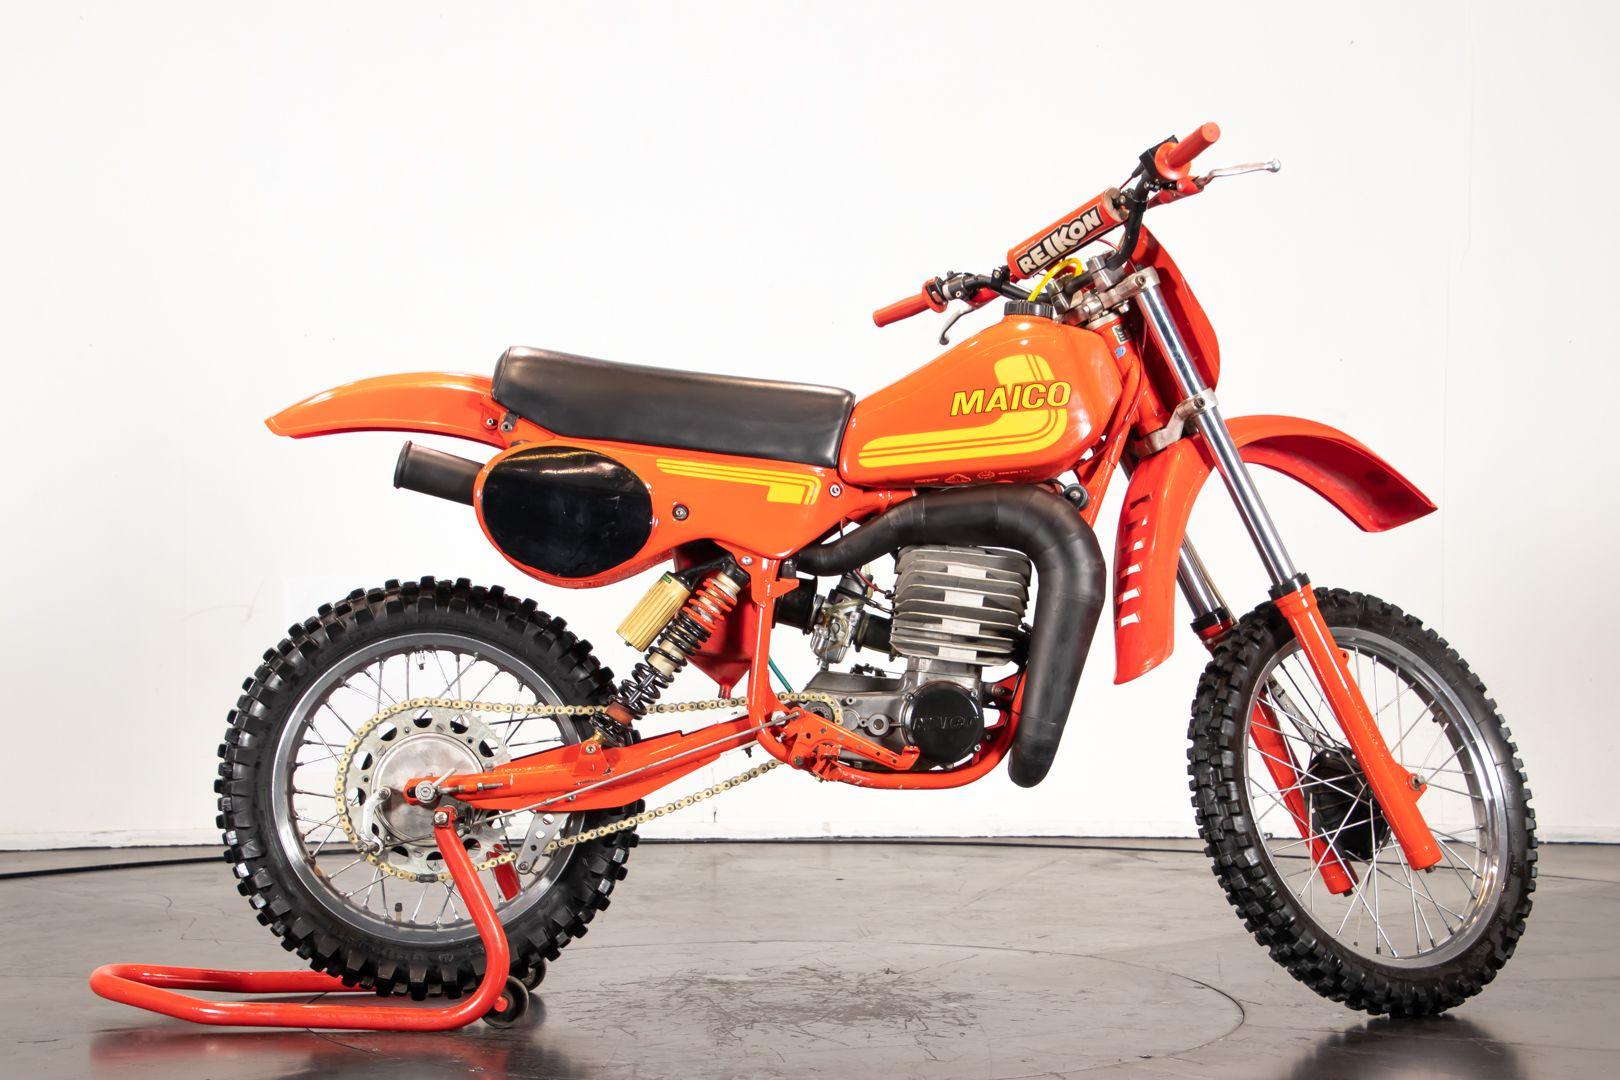 1981 Maico Cross 250 with 400cc Engine 26817